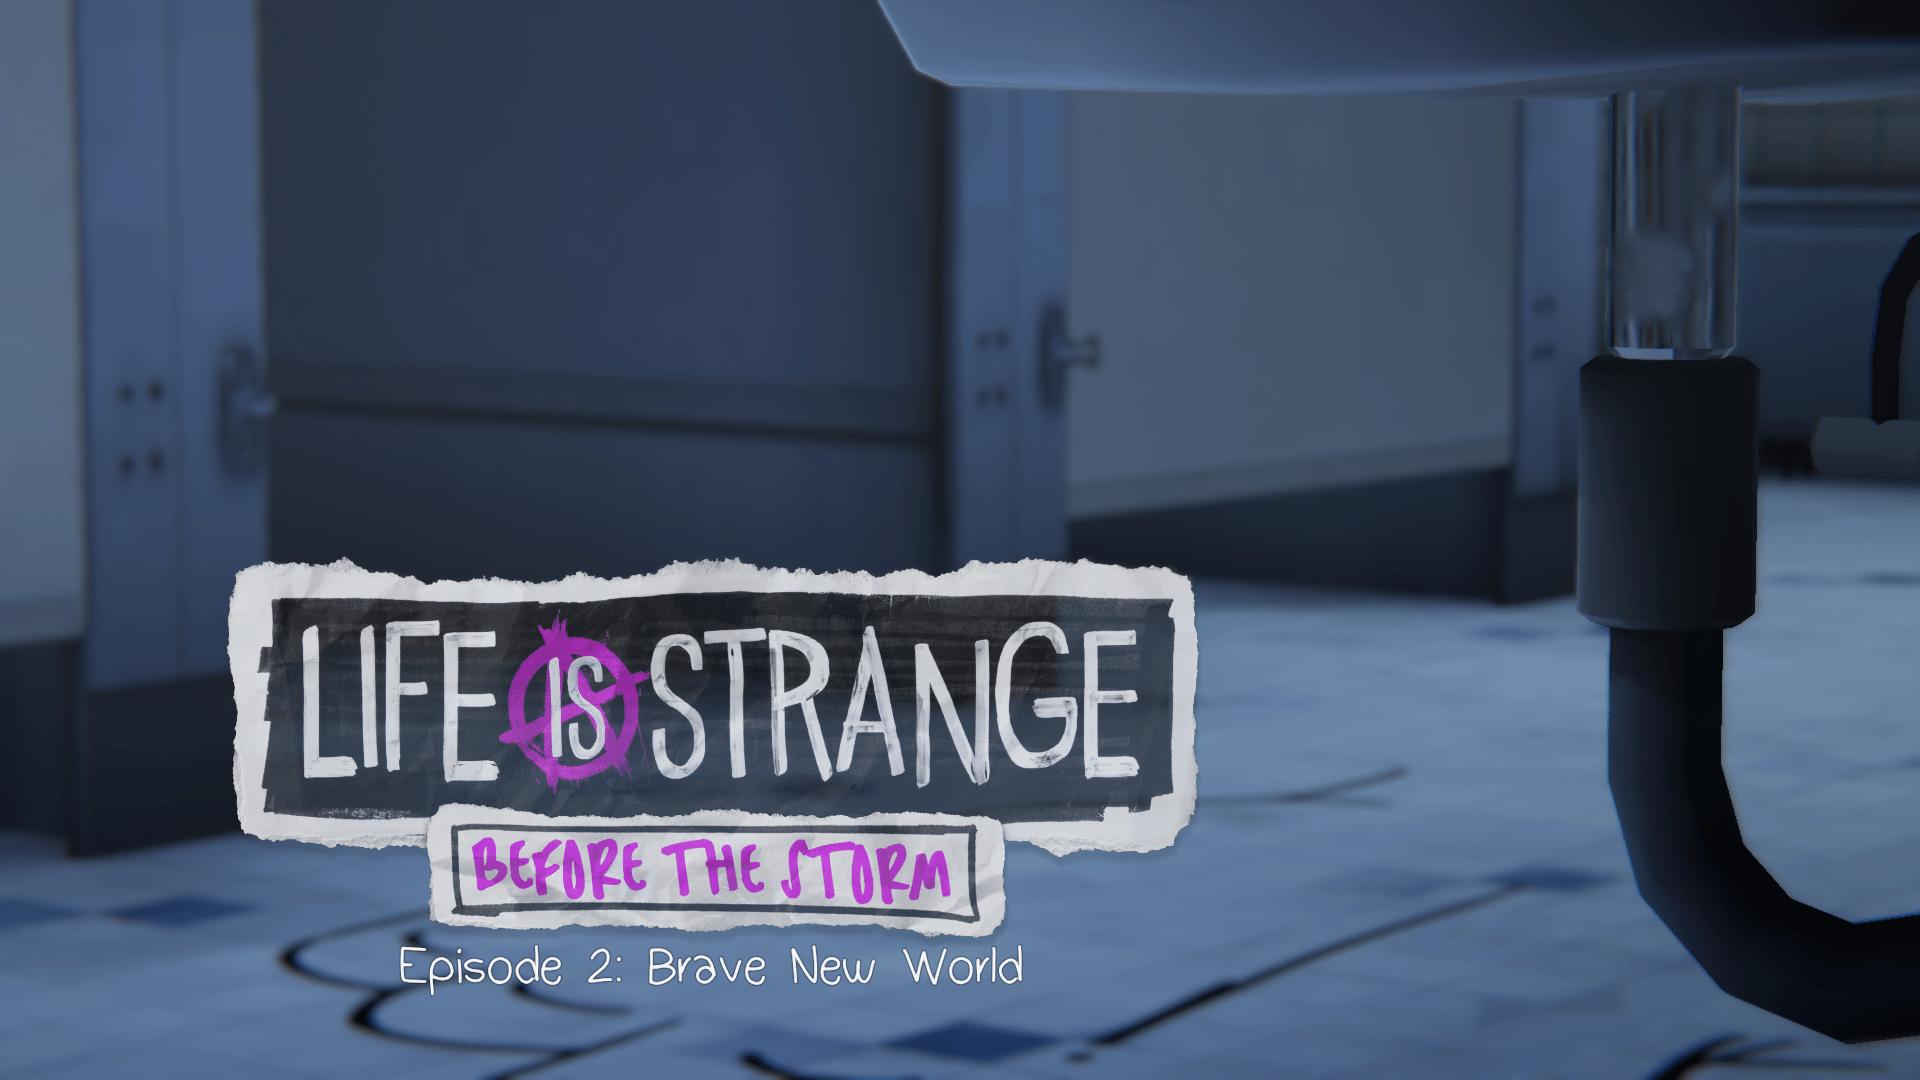 life is strange ep2 title